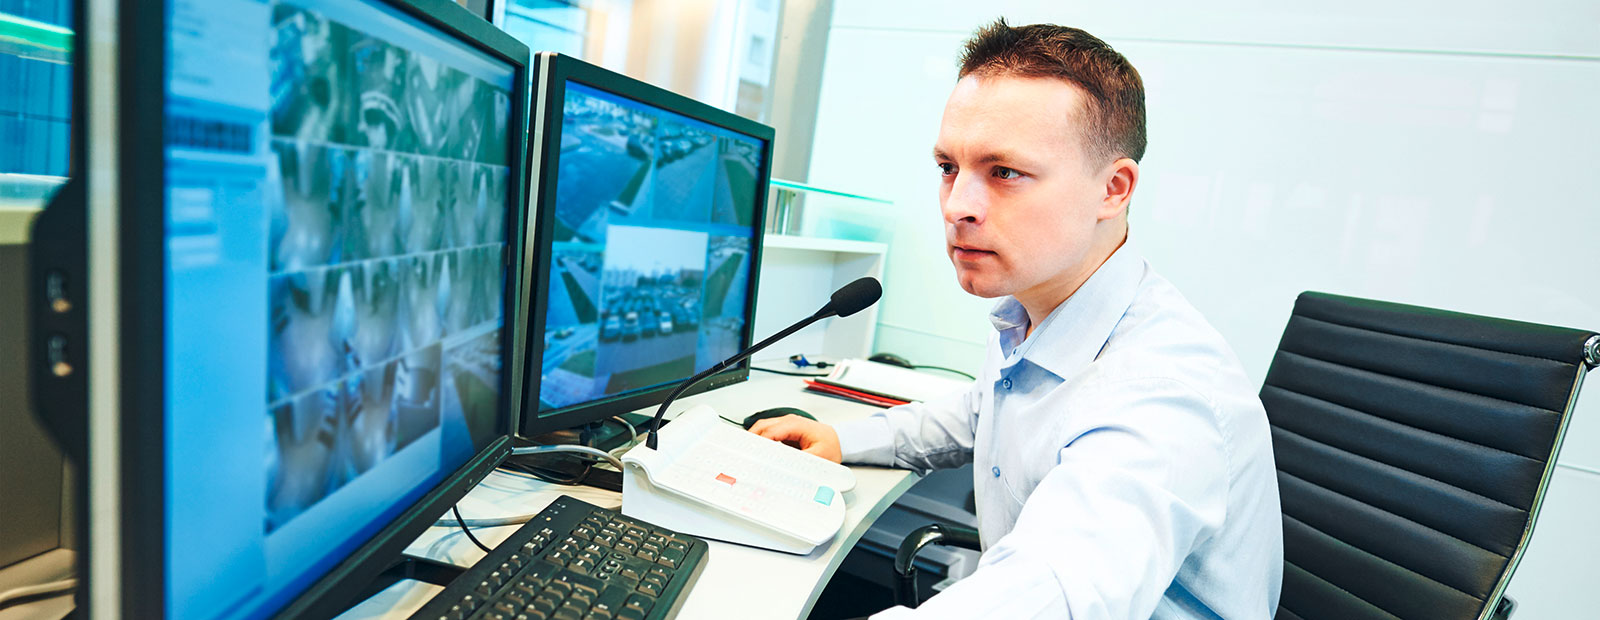 kontrollzentrum multimedia lösung